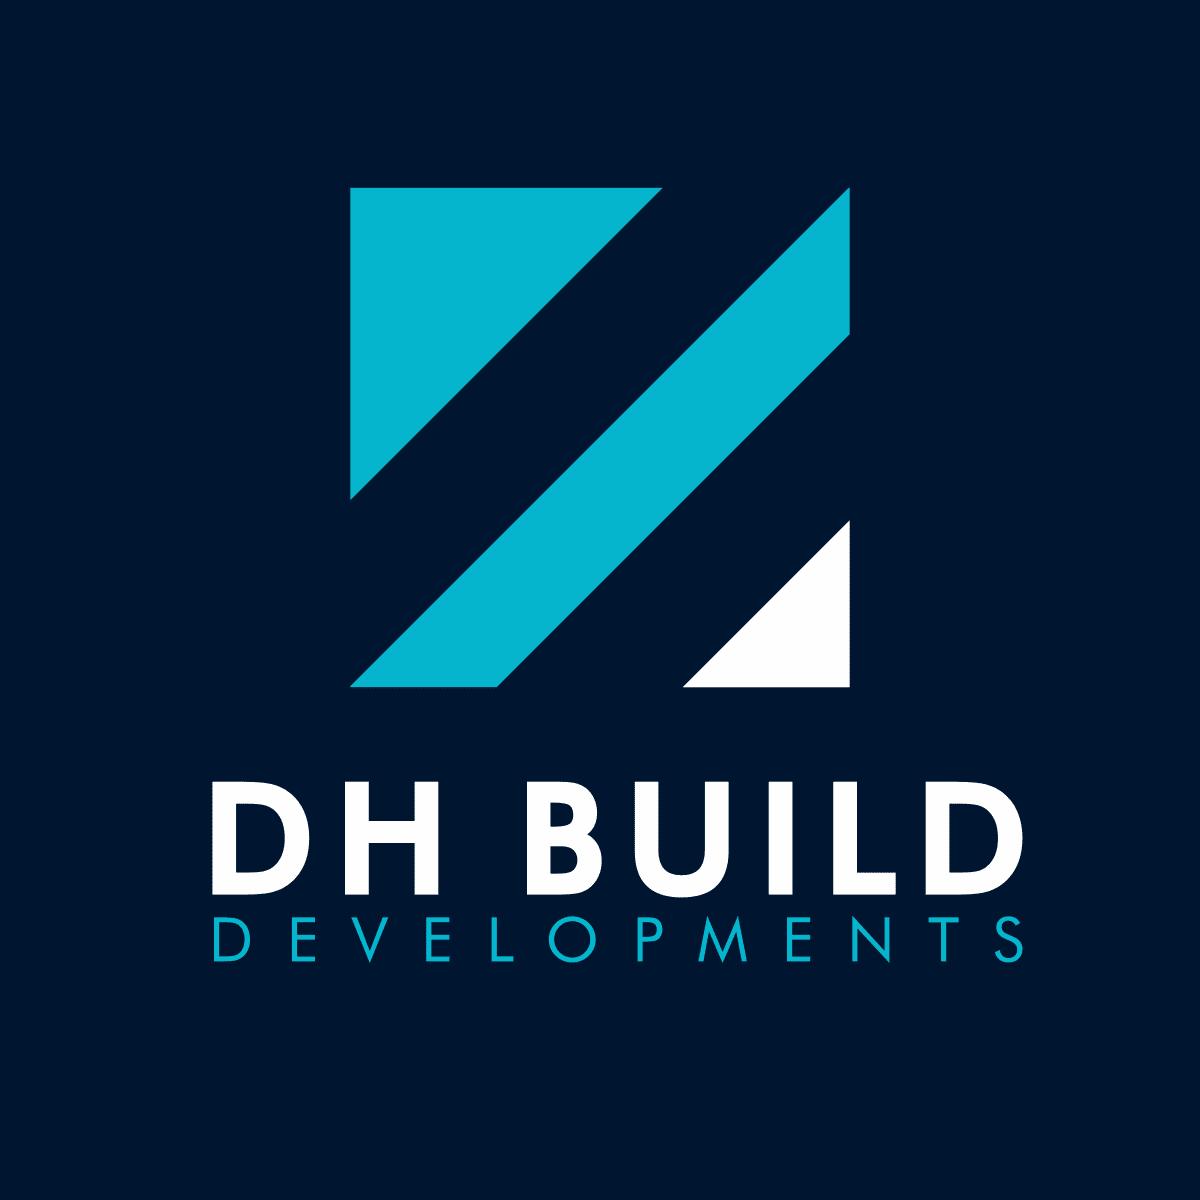 Logo Design Plymouth - DH Build Developments - Web Design and SEO Company